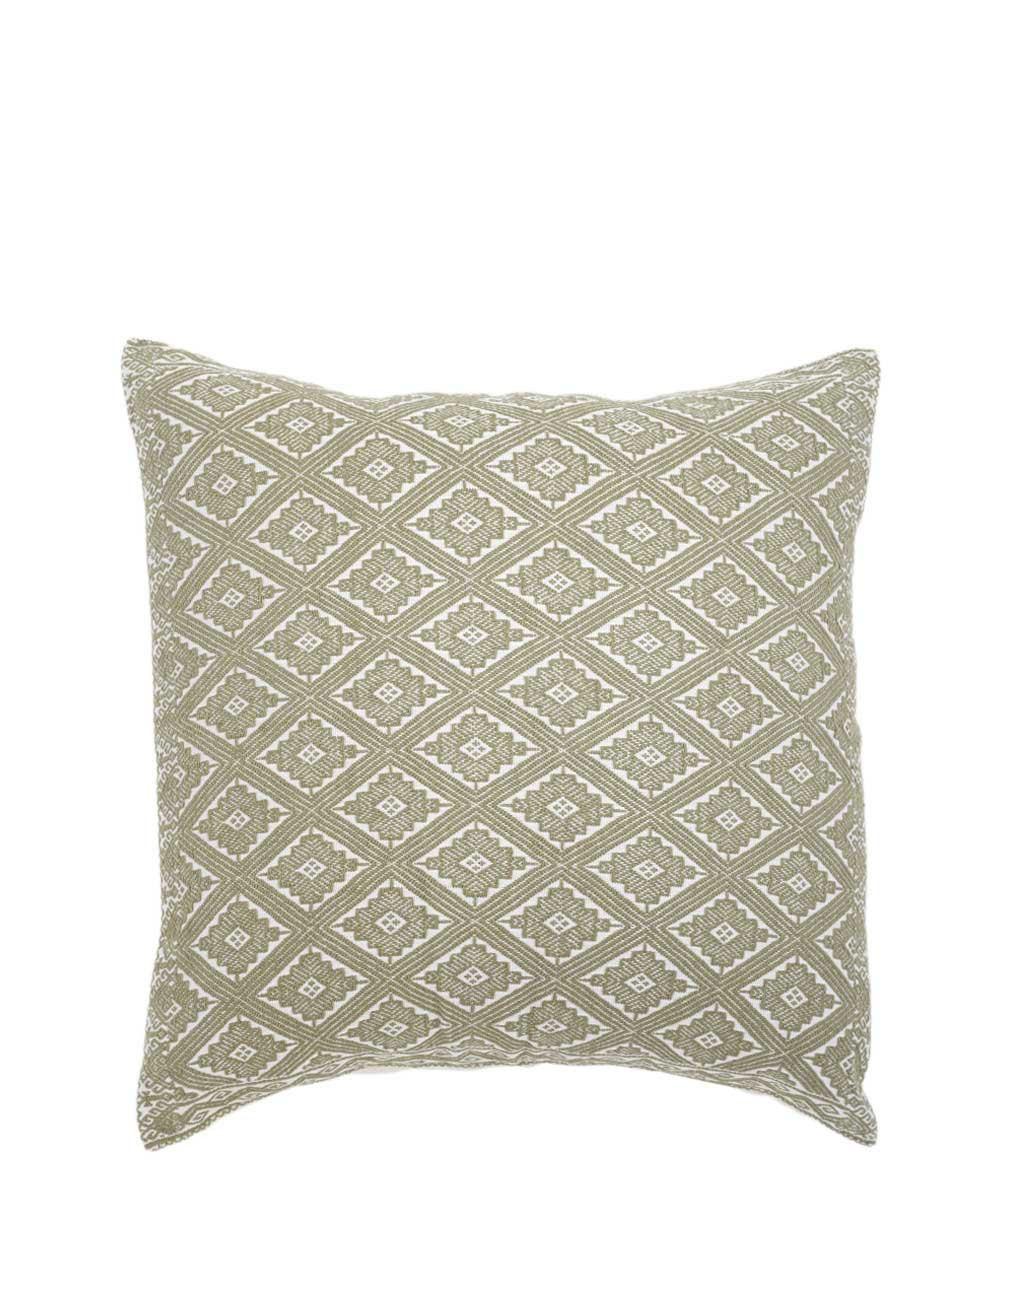 Woven-Pillow---Cecilia-_The-Little-Market